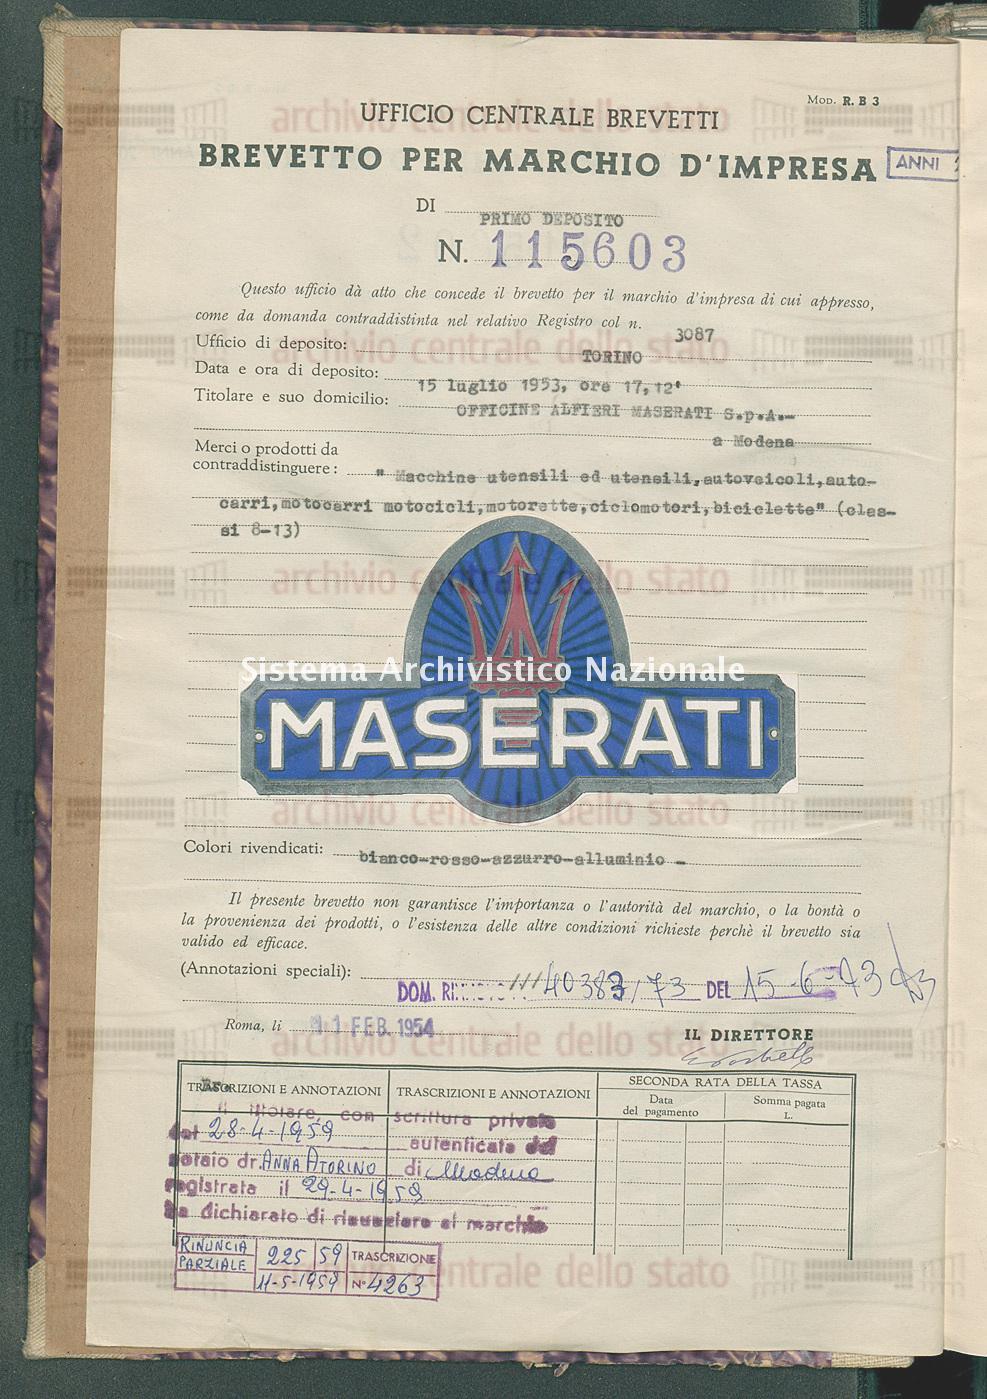 'Macchine utensili ed utensili, autoveicoli, autocarri, motocarri ecc. Officine Alfieri Maserati S.P.A. (11/02/1954)